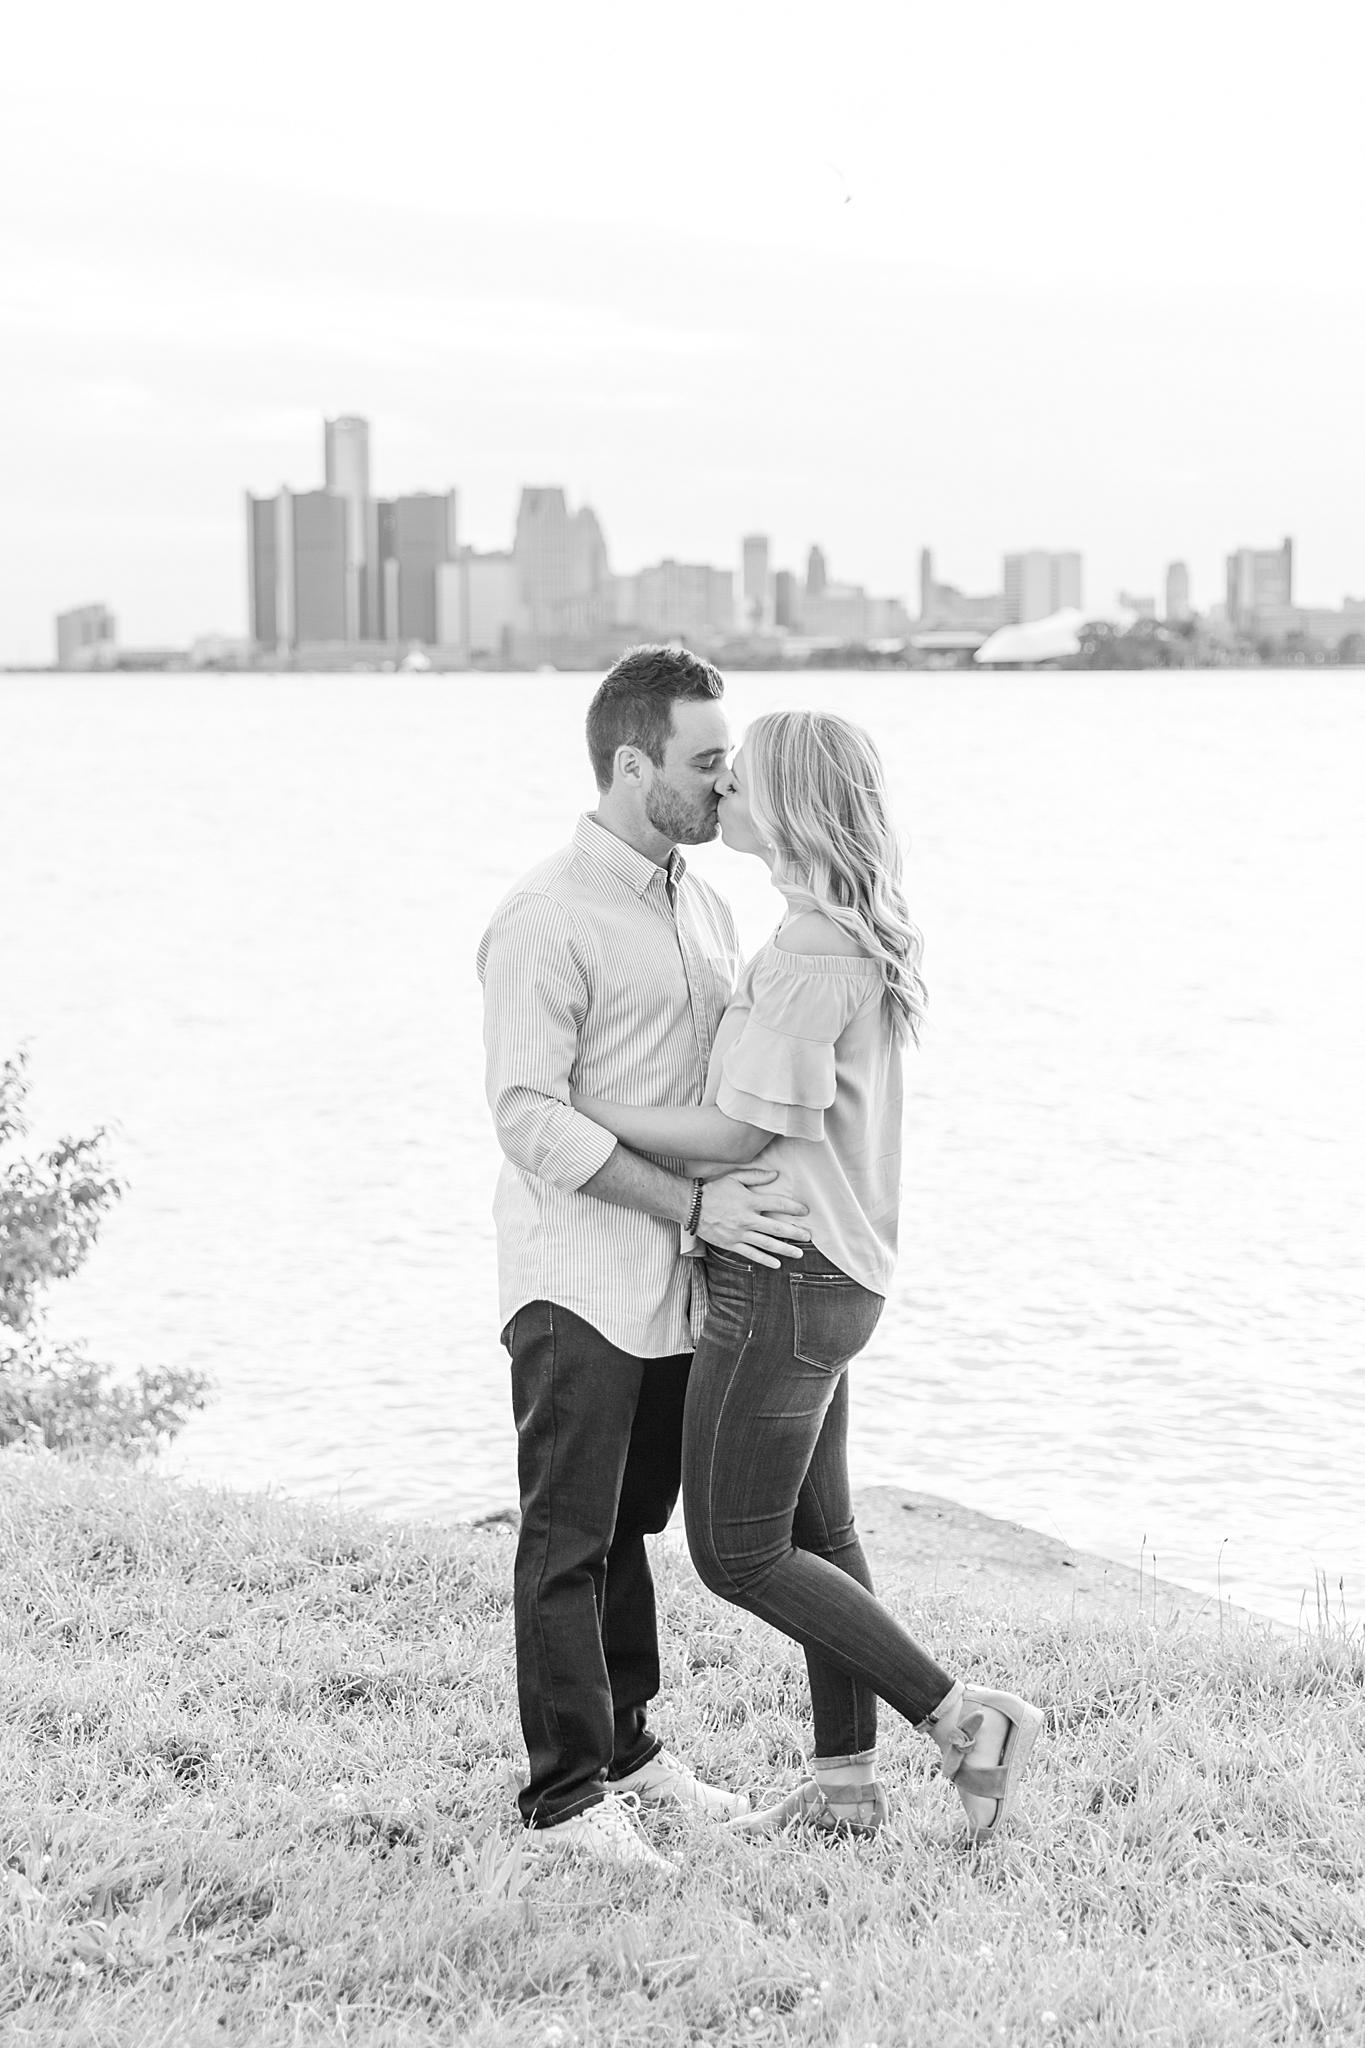 detroit-wedding-photographer-downtown-detroit-belle-isle-engagement-photos-sarah-eric-by-courtney-carolyn-photography_0039.jpg